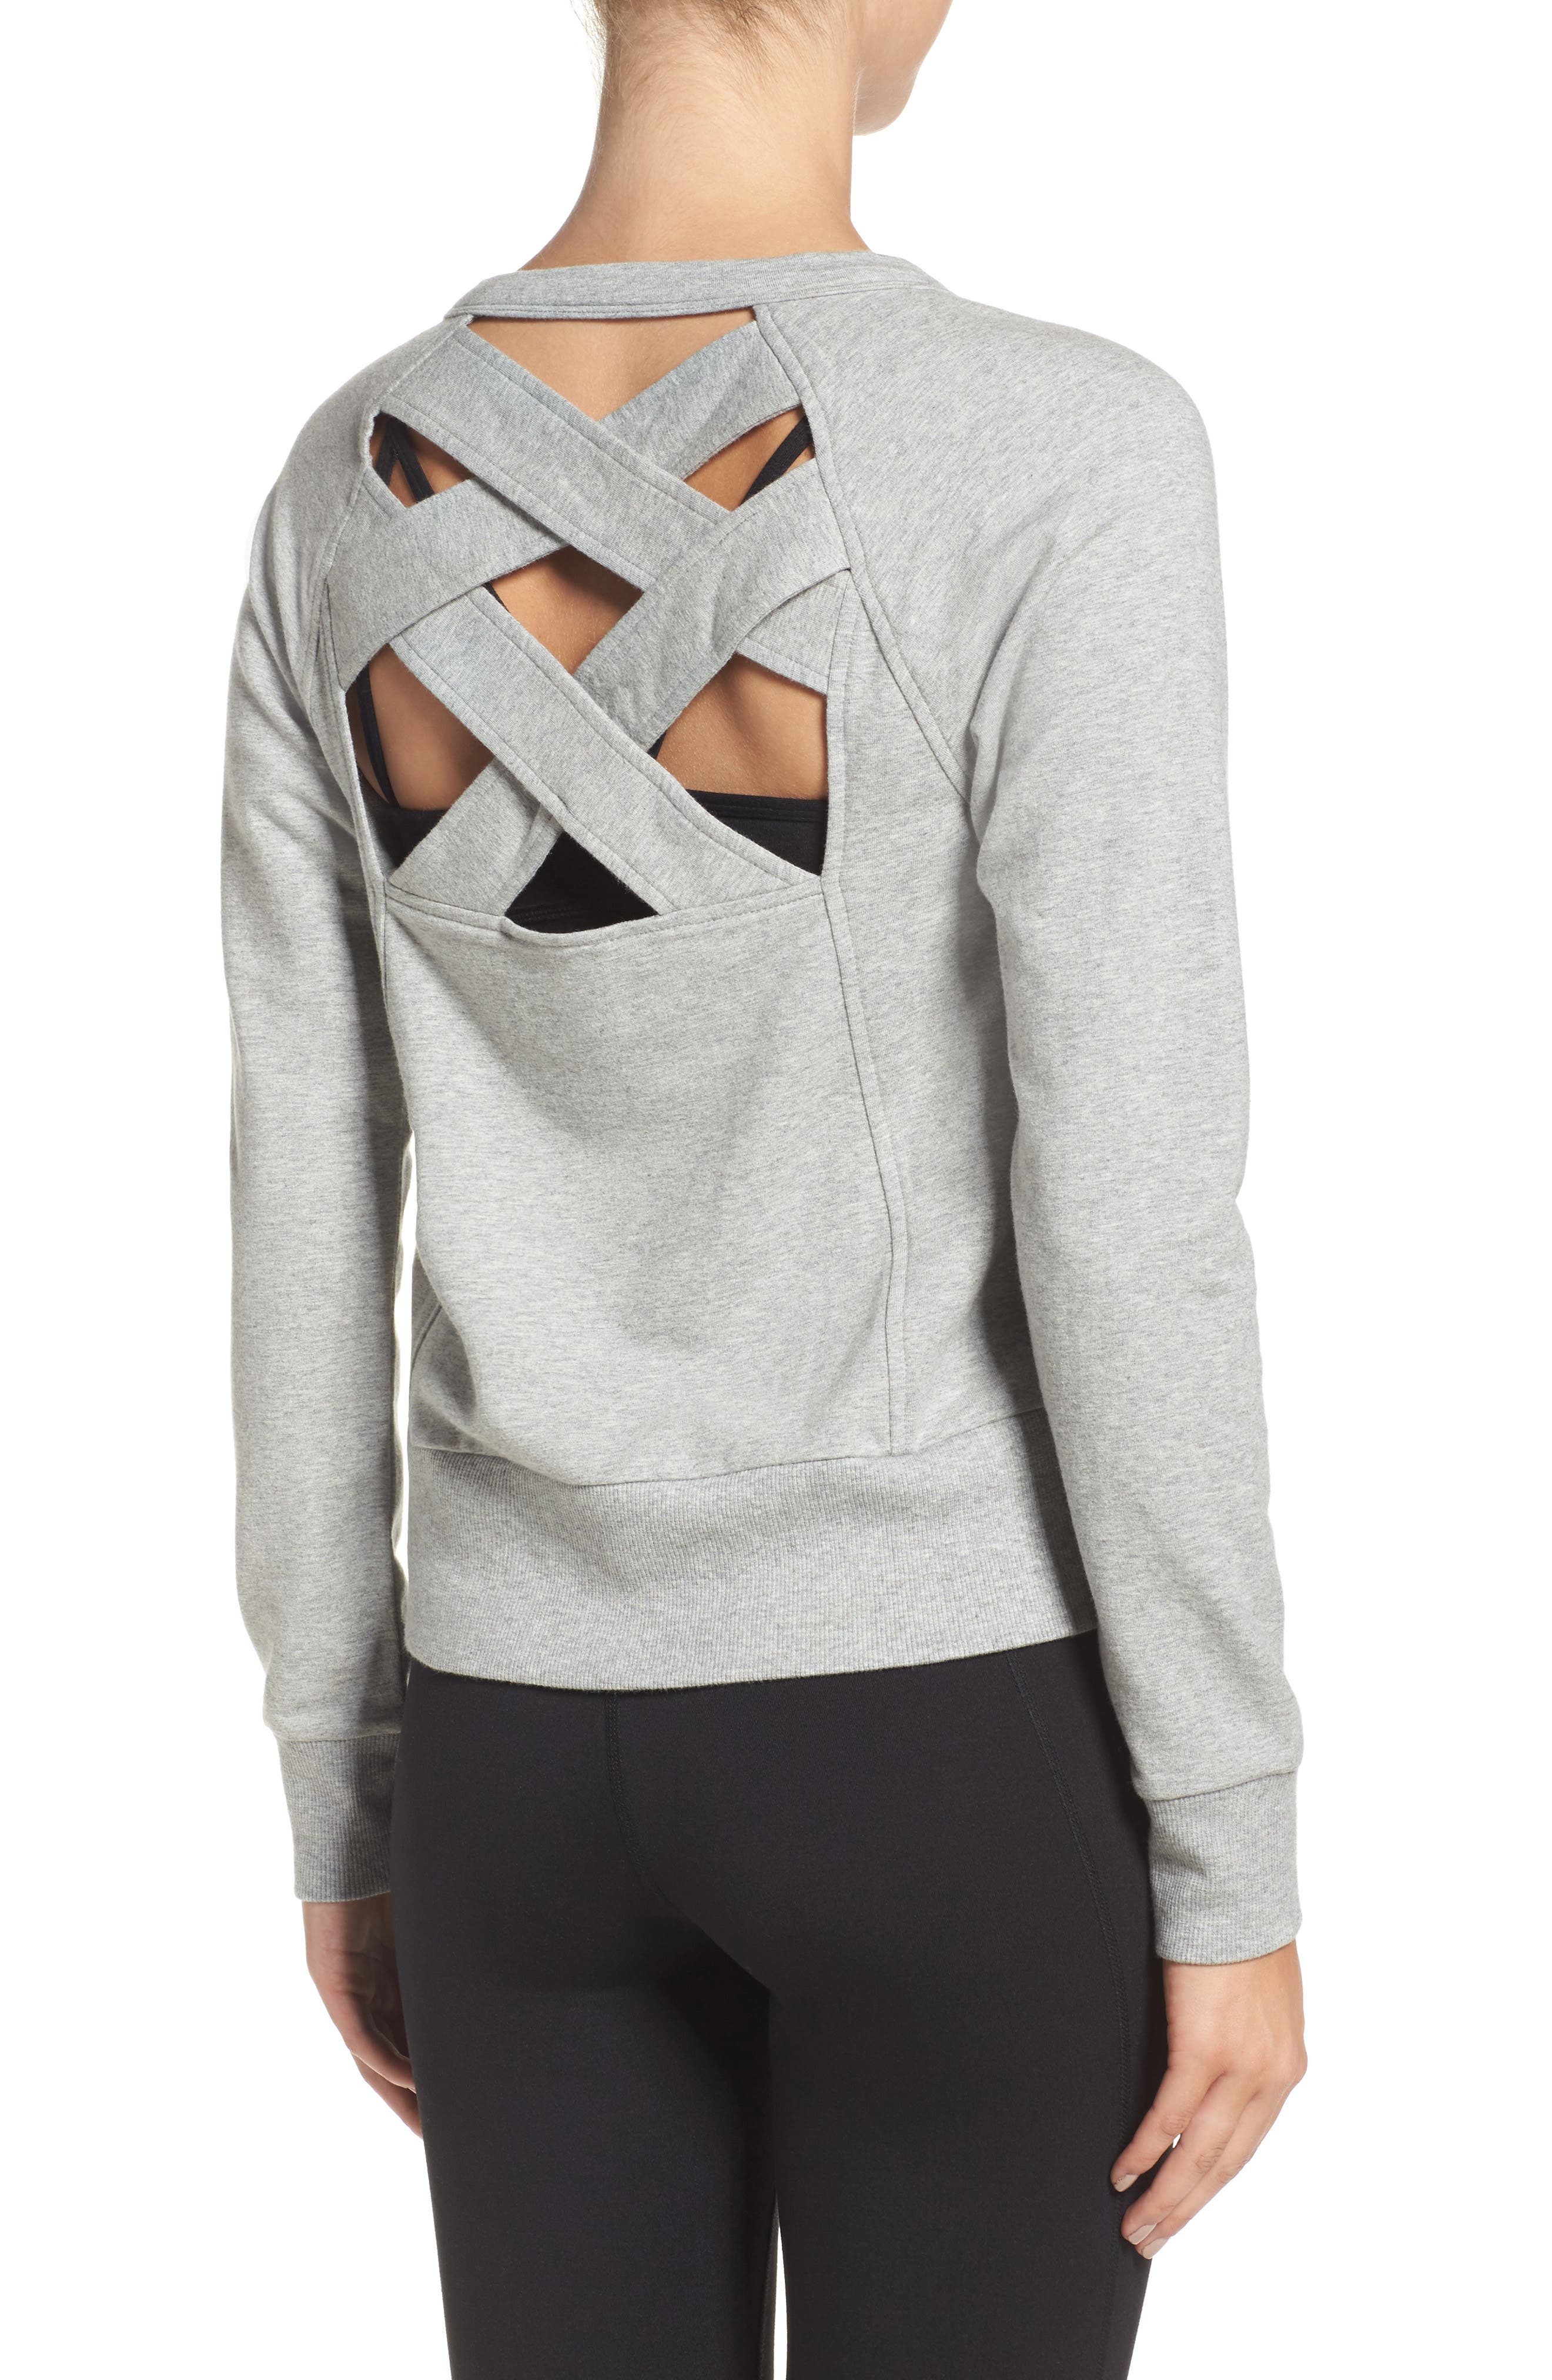 Main Image - Zella Covet Crisscross Sweatshirt